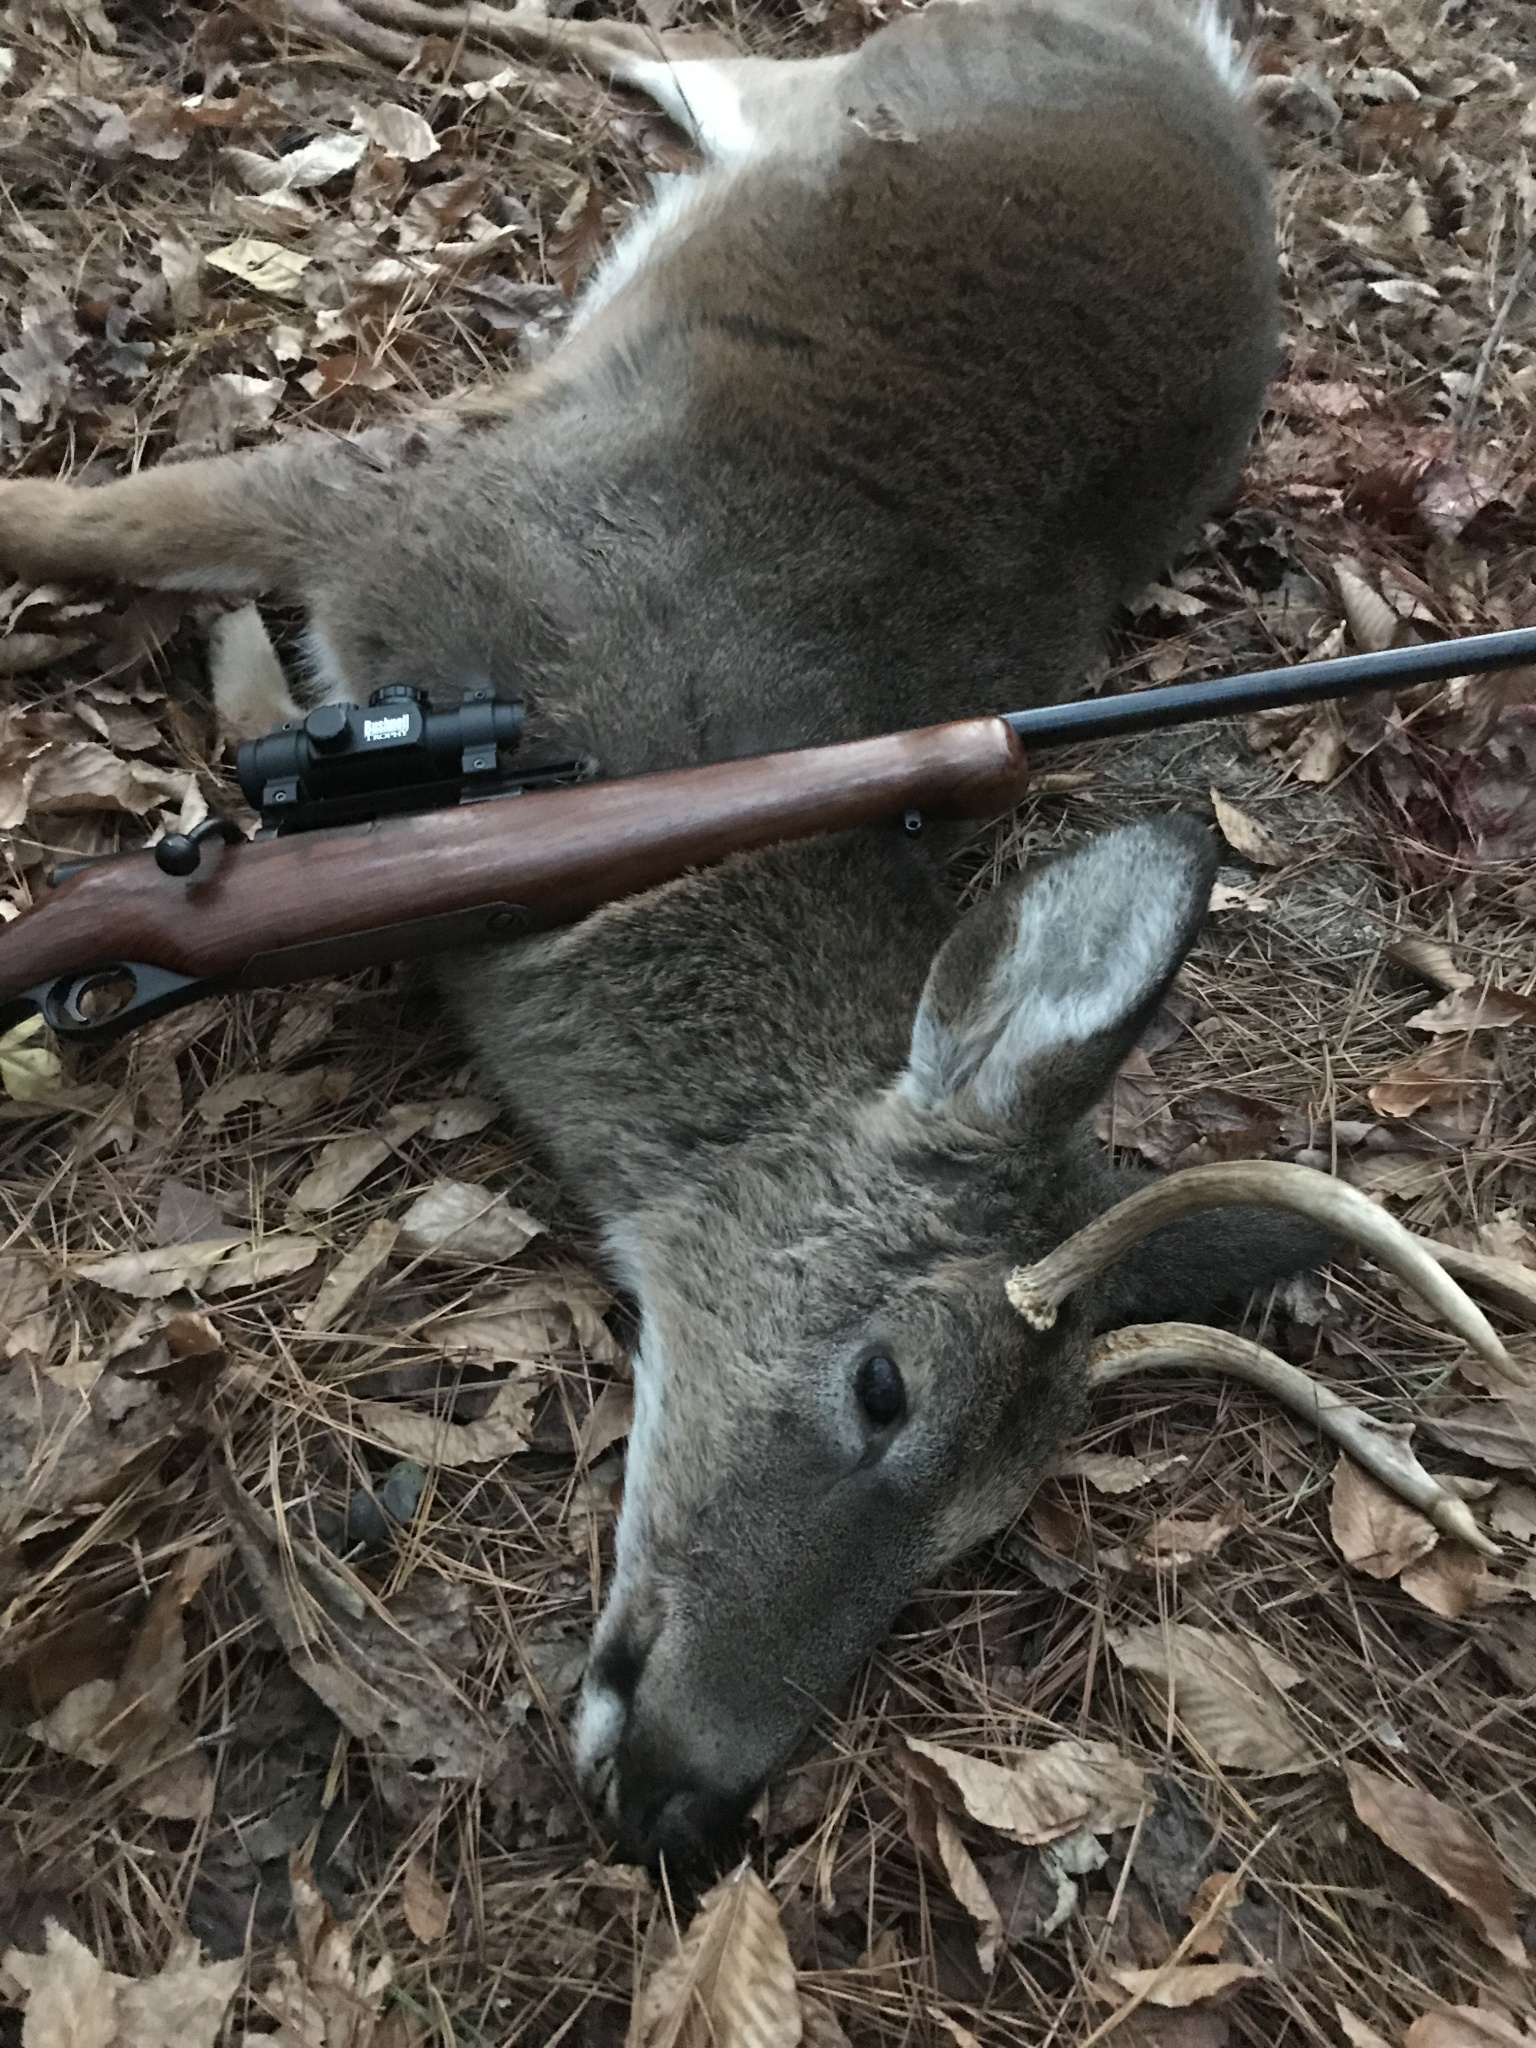 410 Slugs and Buckshot? - Graybeard Outdoors